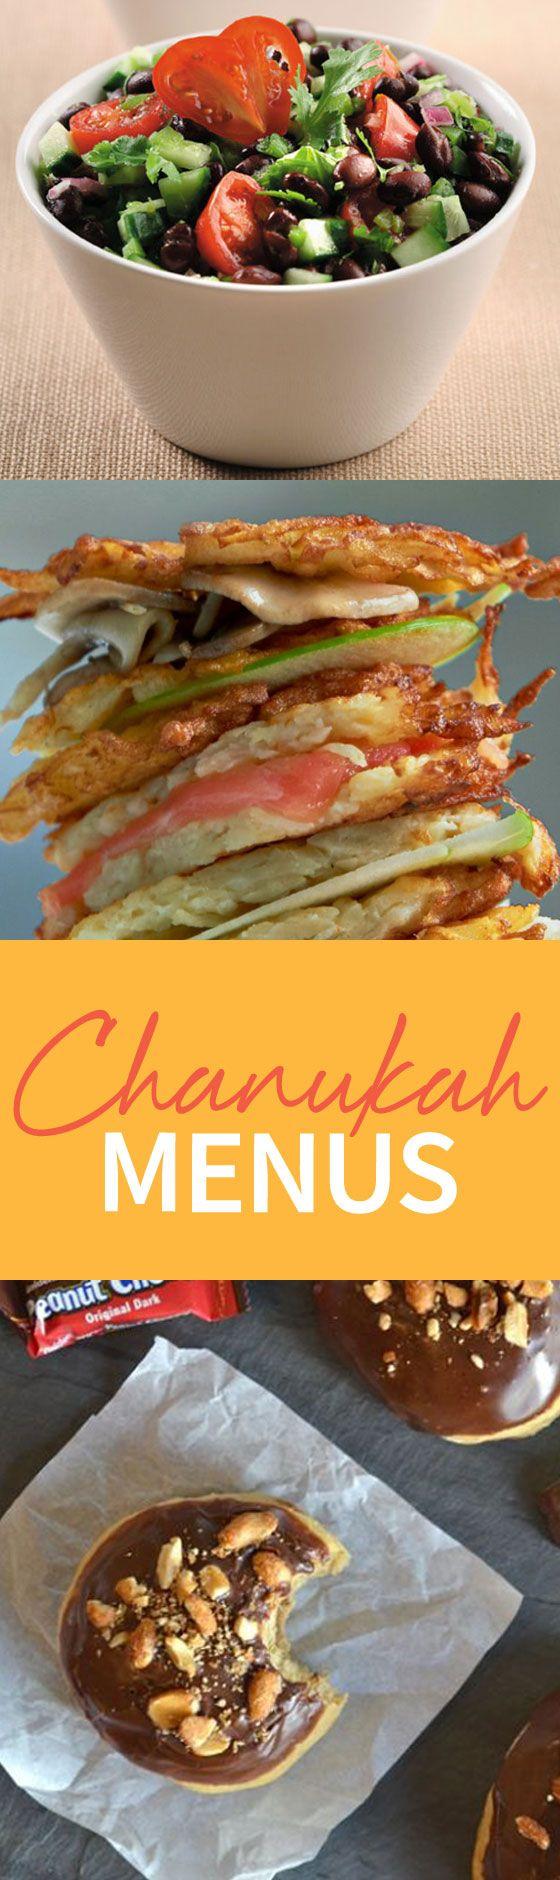 Full menus, recipe, and decorations--we have it all! Follow our Chanukah Menu this year! http://www.joyofkosher.com/tag/chanukah-menus/